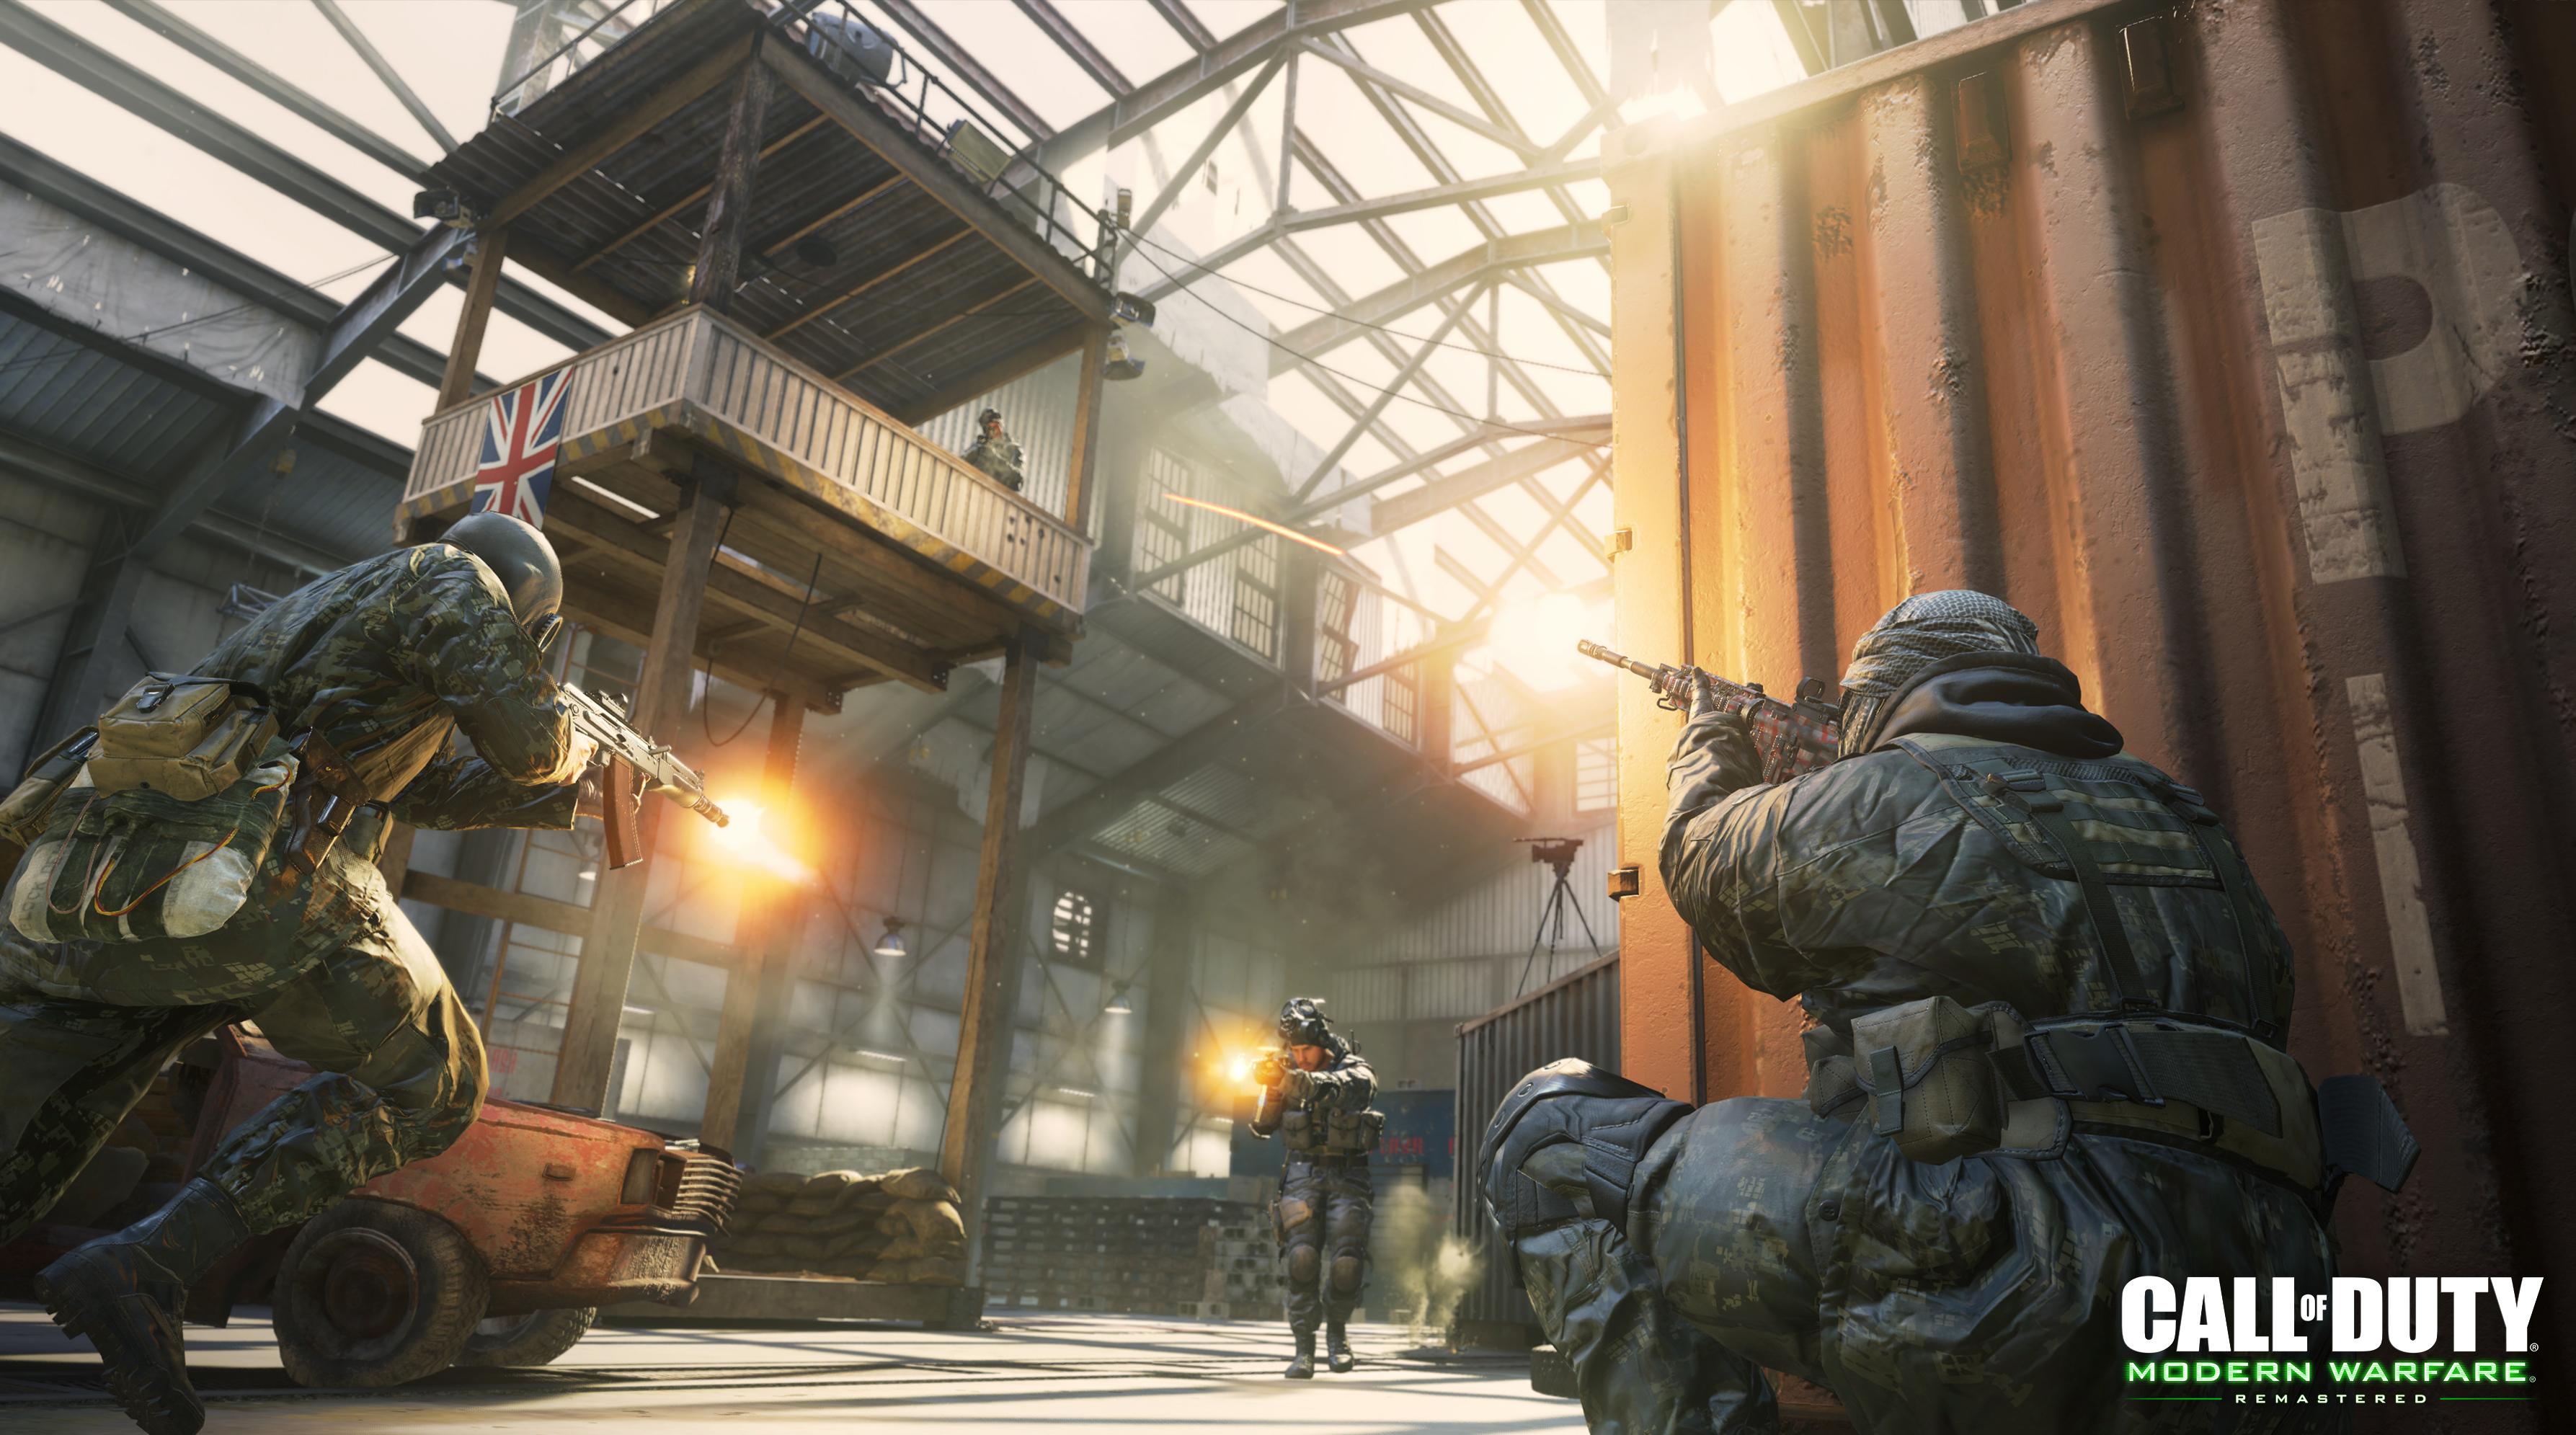 Call Of Duty Modern Warfare Remastered 2017 Wallpaper Hd